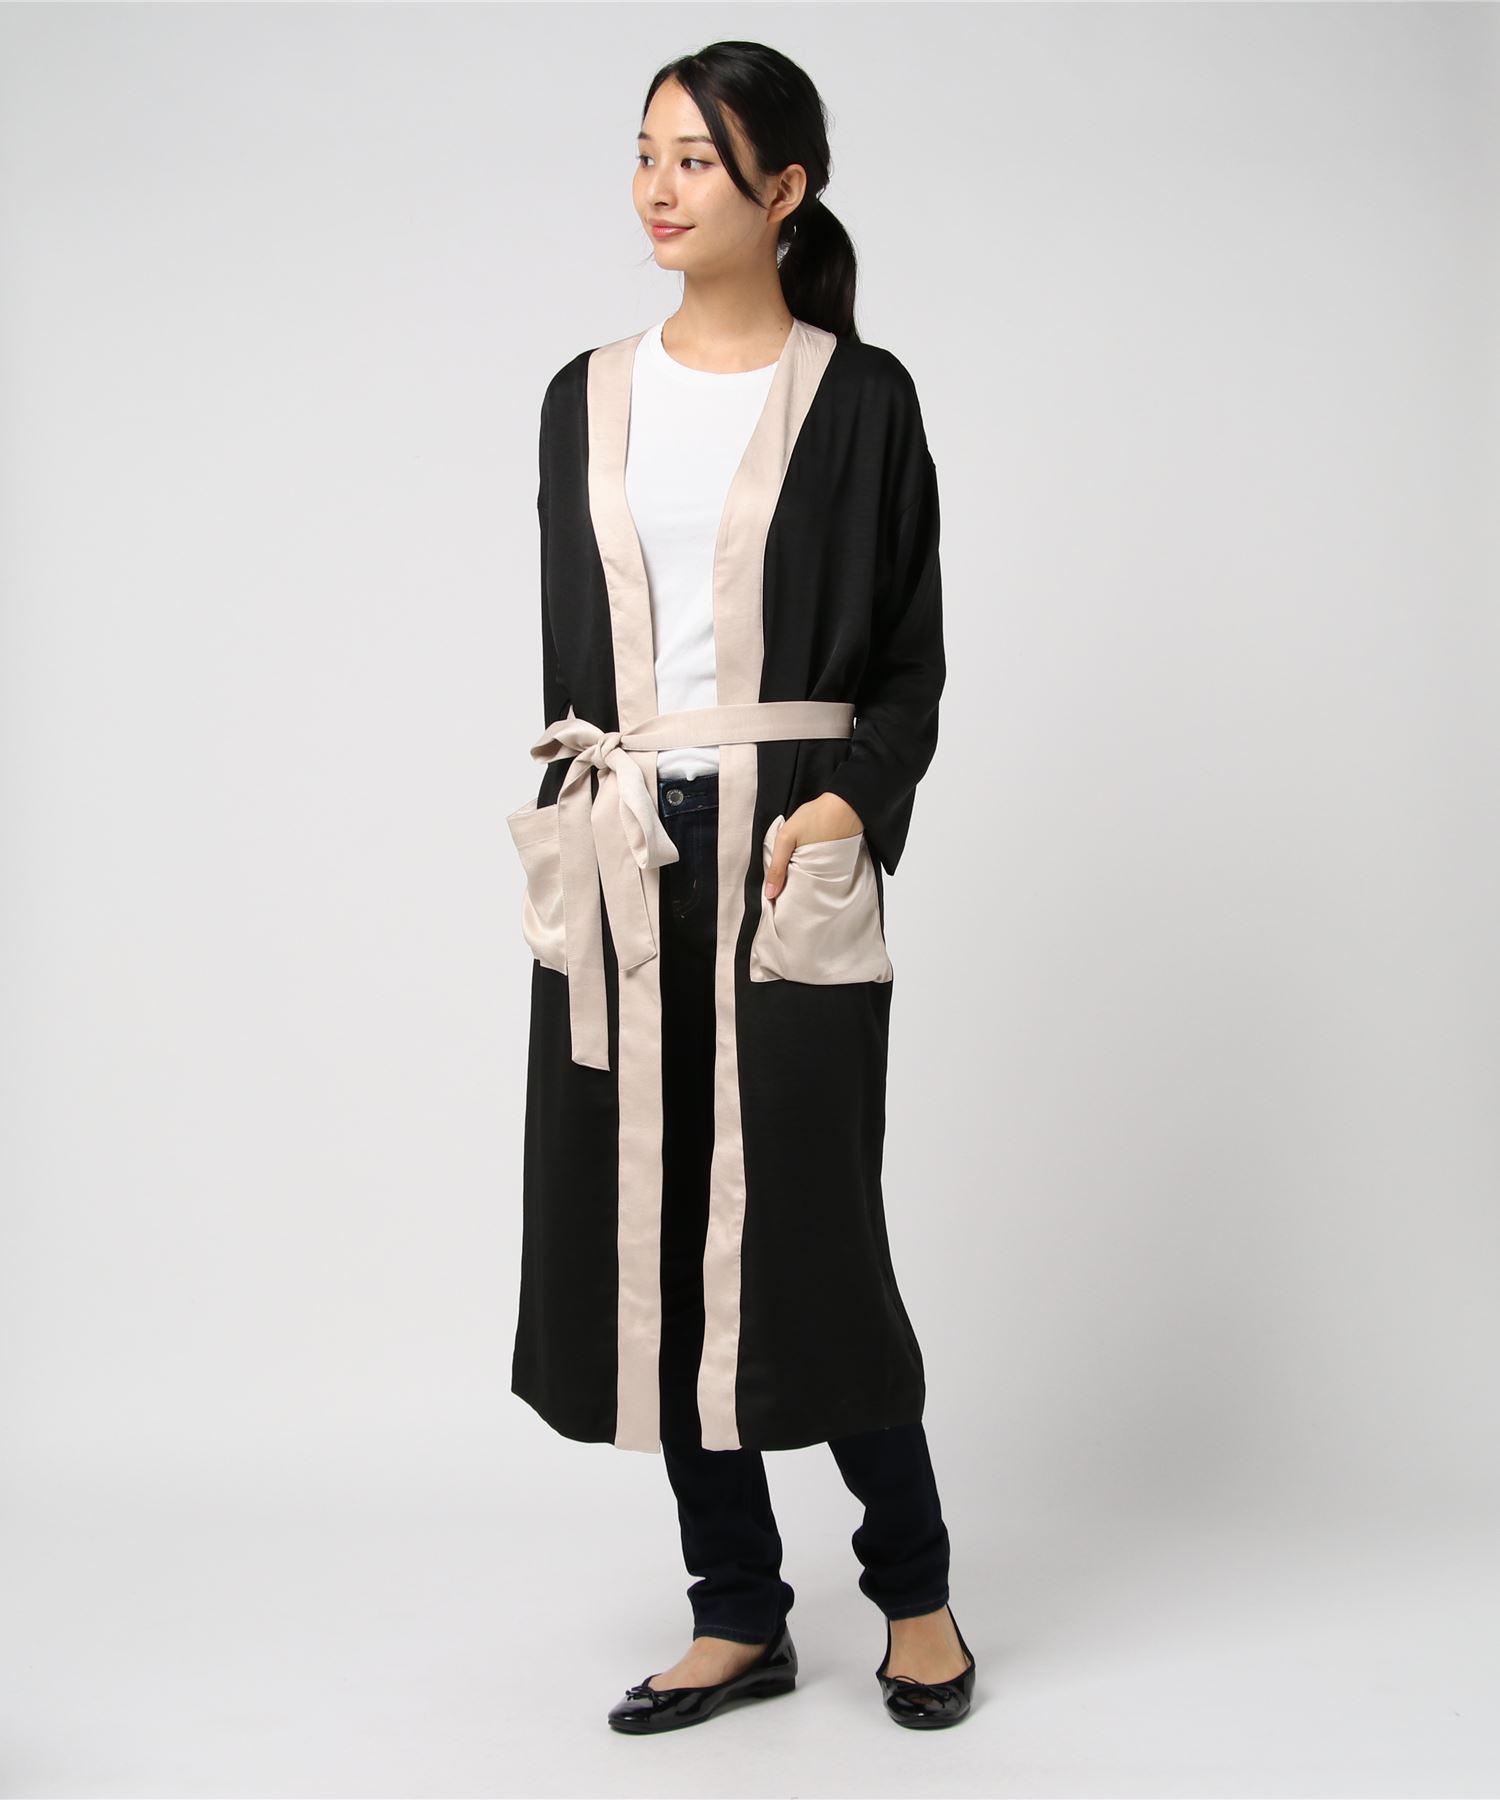 American Rag Cie Robe Dress/アメリカンラグシー ローブドレス